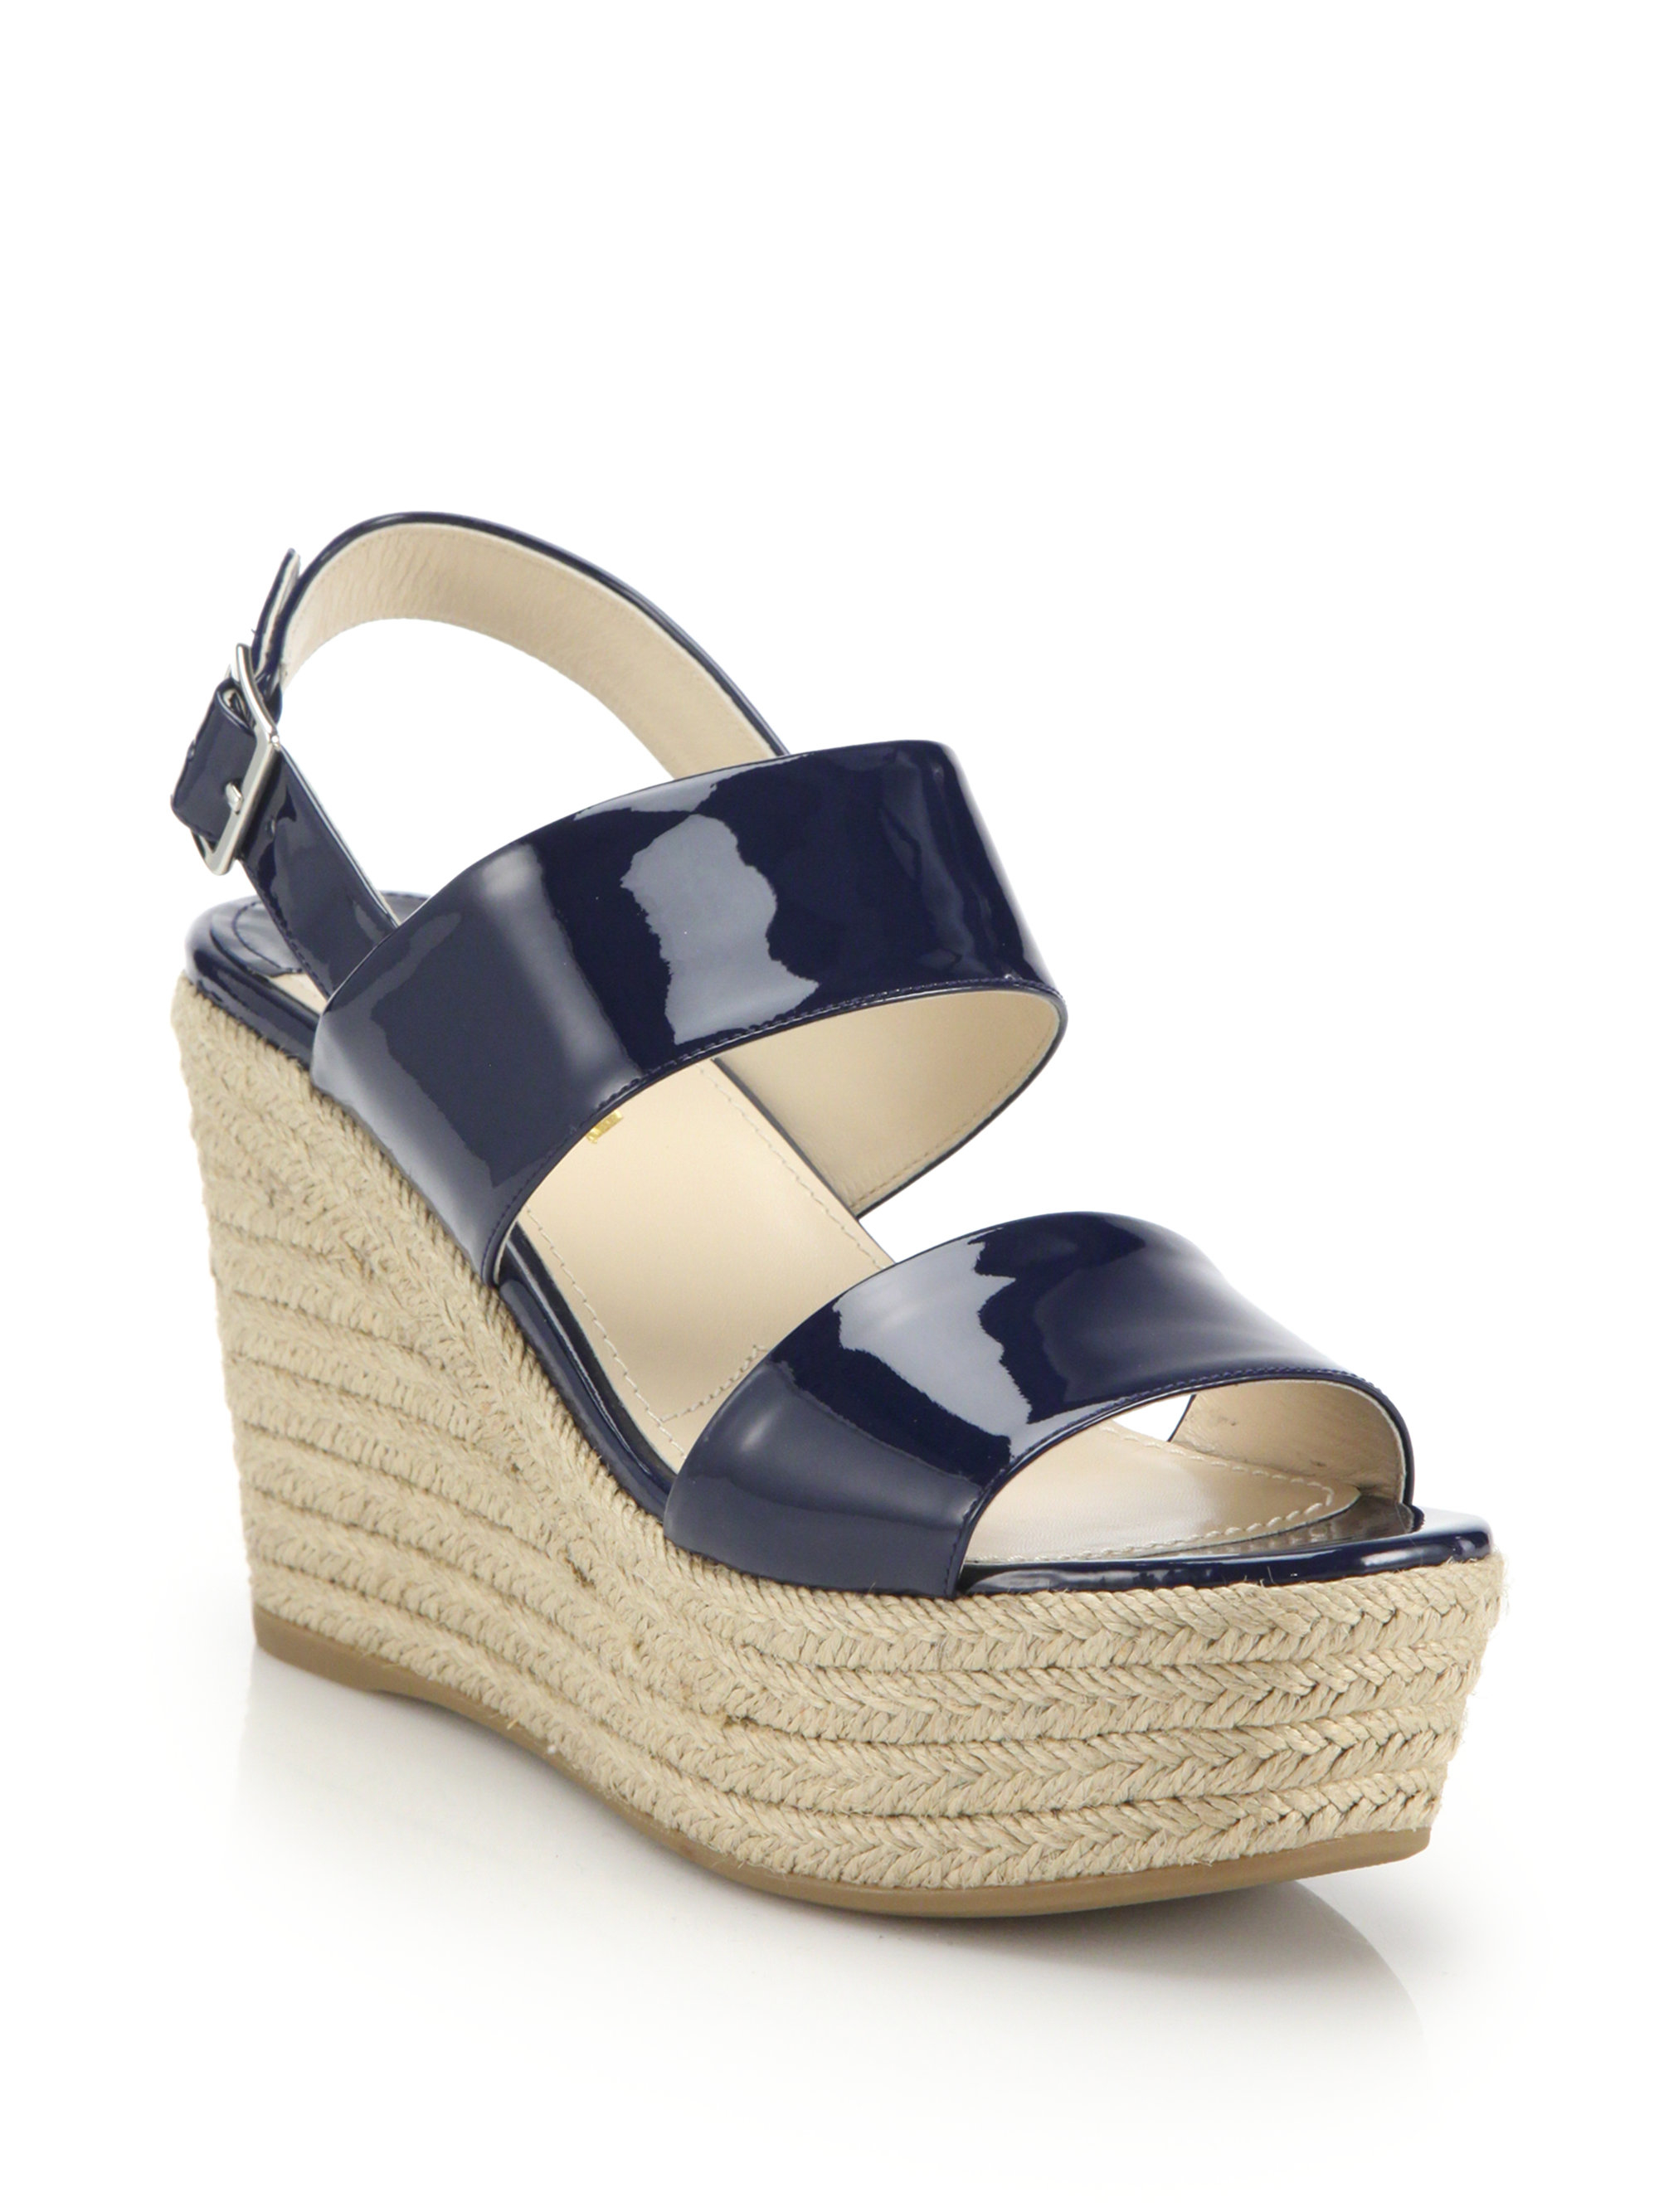 b060744b133 Prada Patent Leather Espadrille Platform Wedge Sandals in Blue